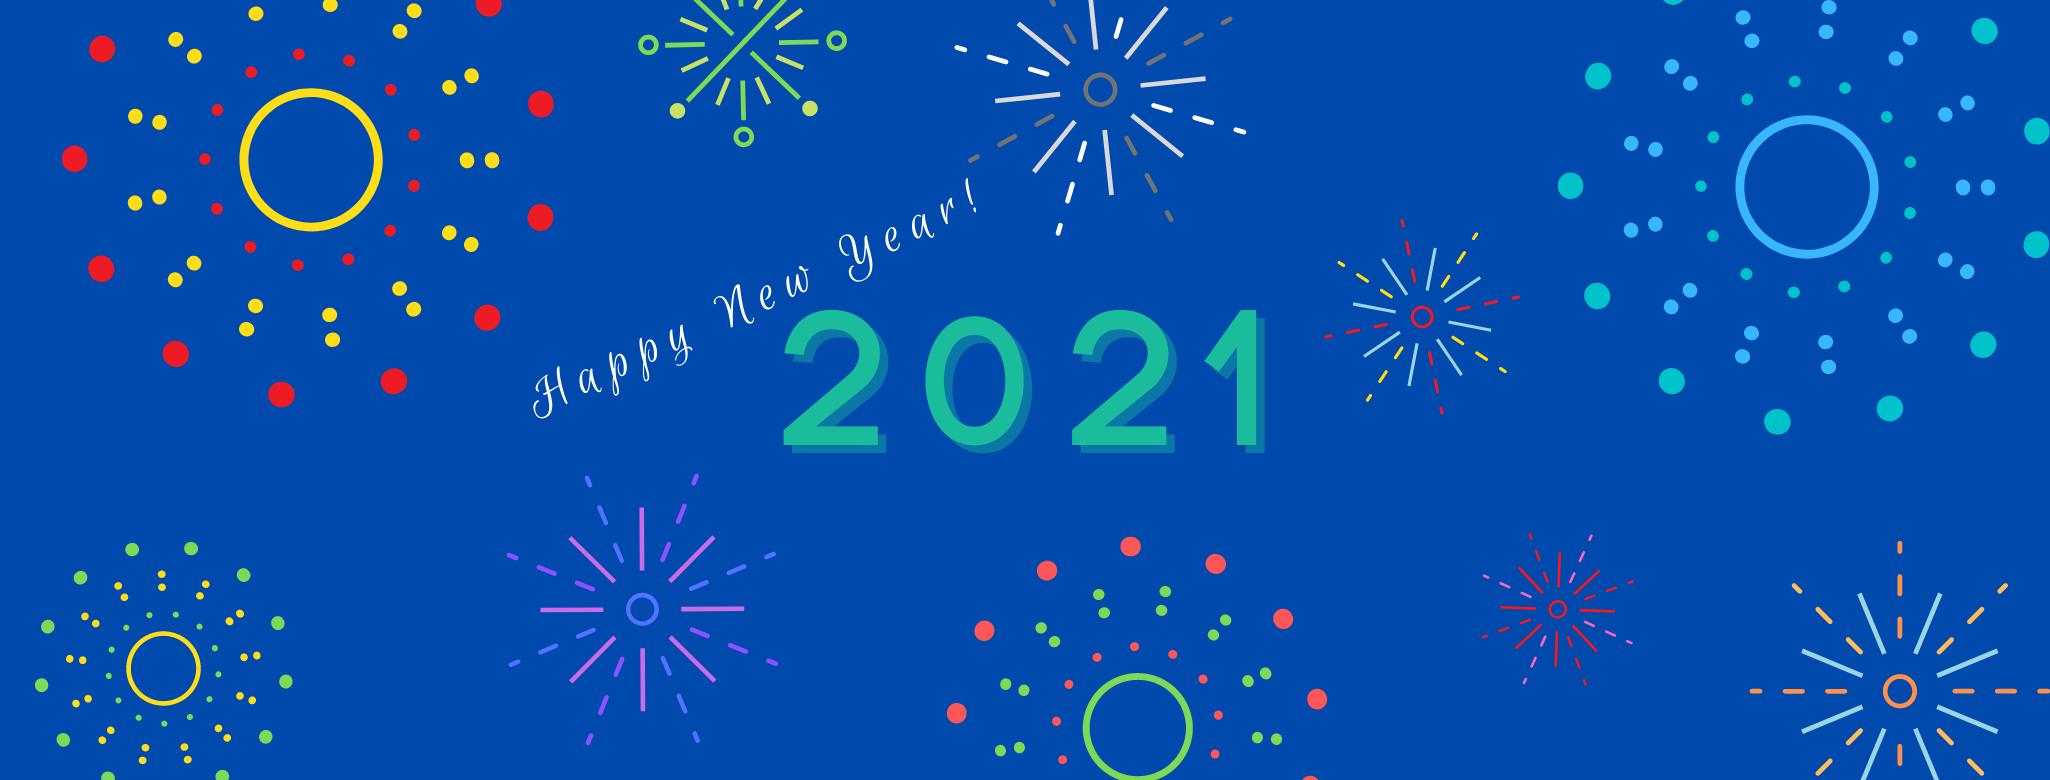 2021 Happy New Year Banner